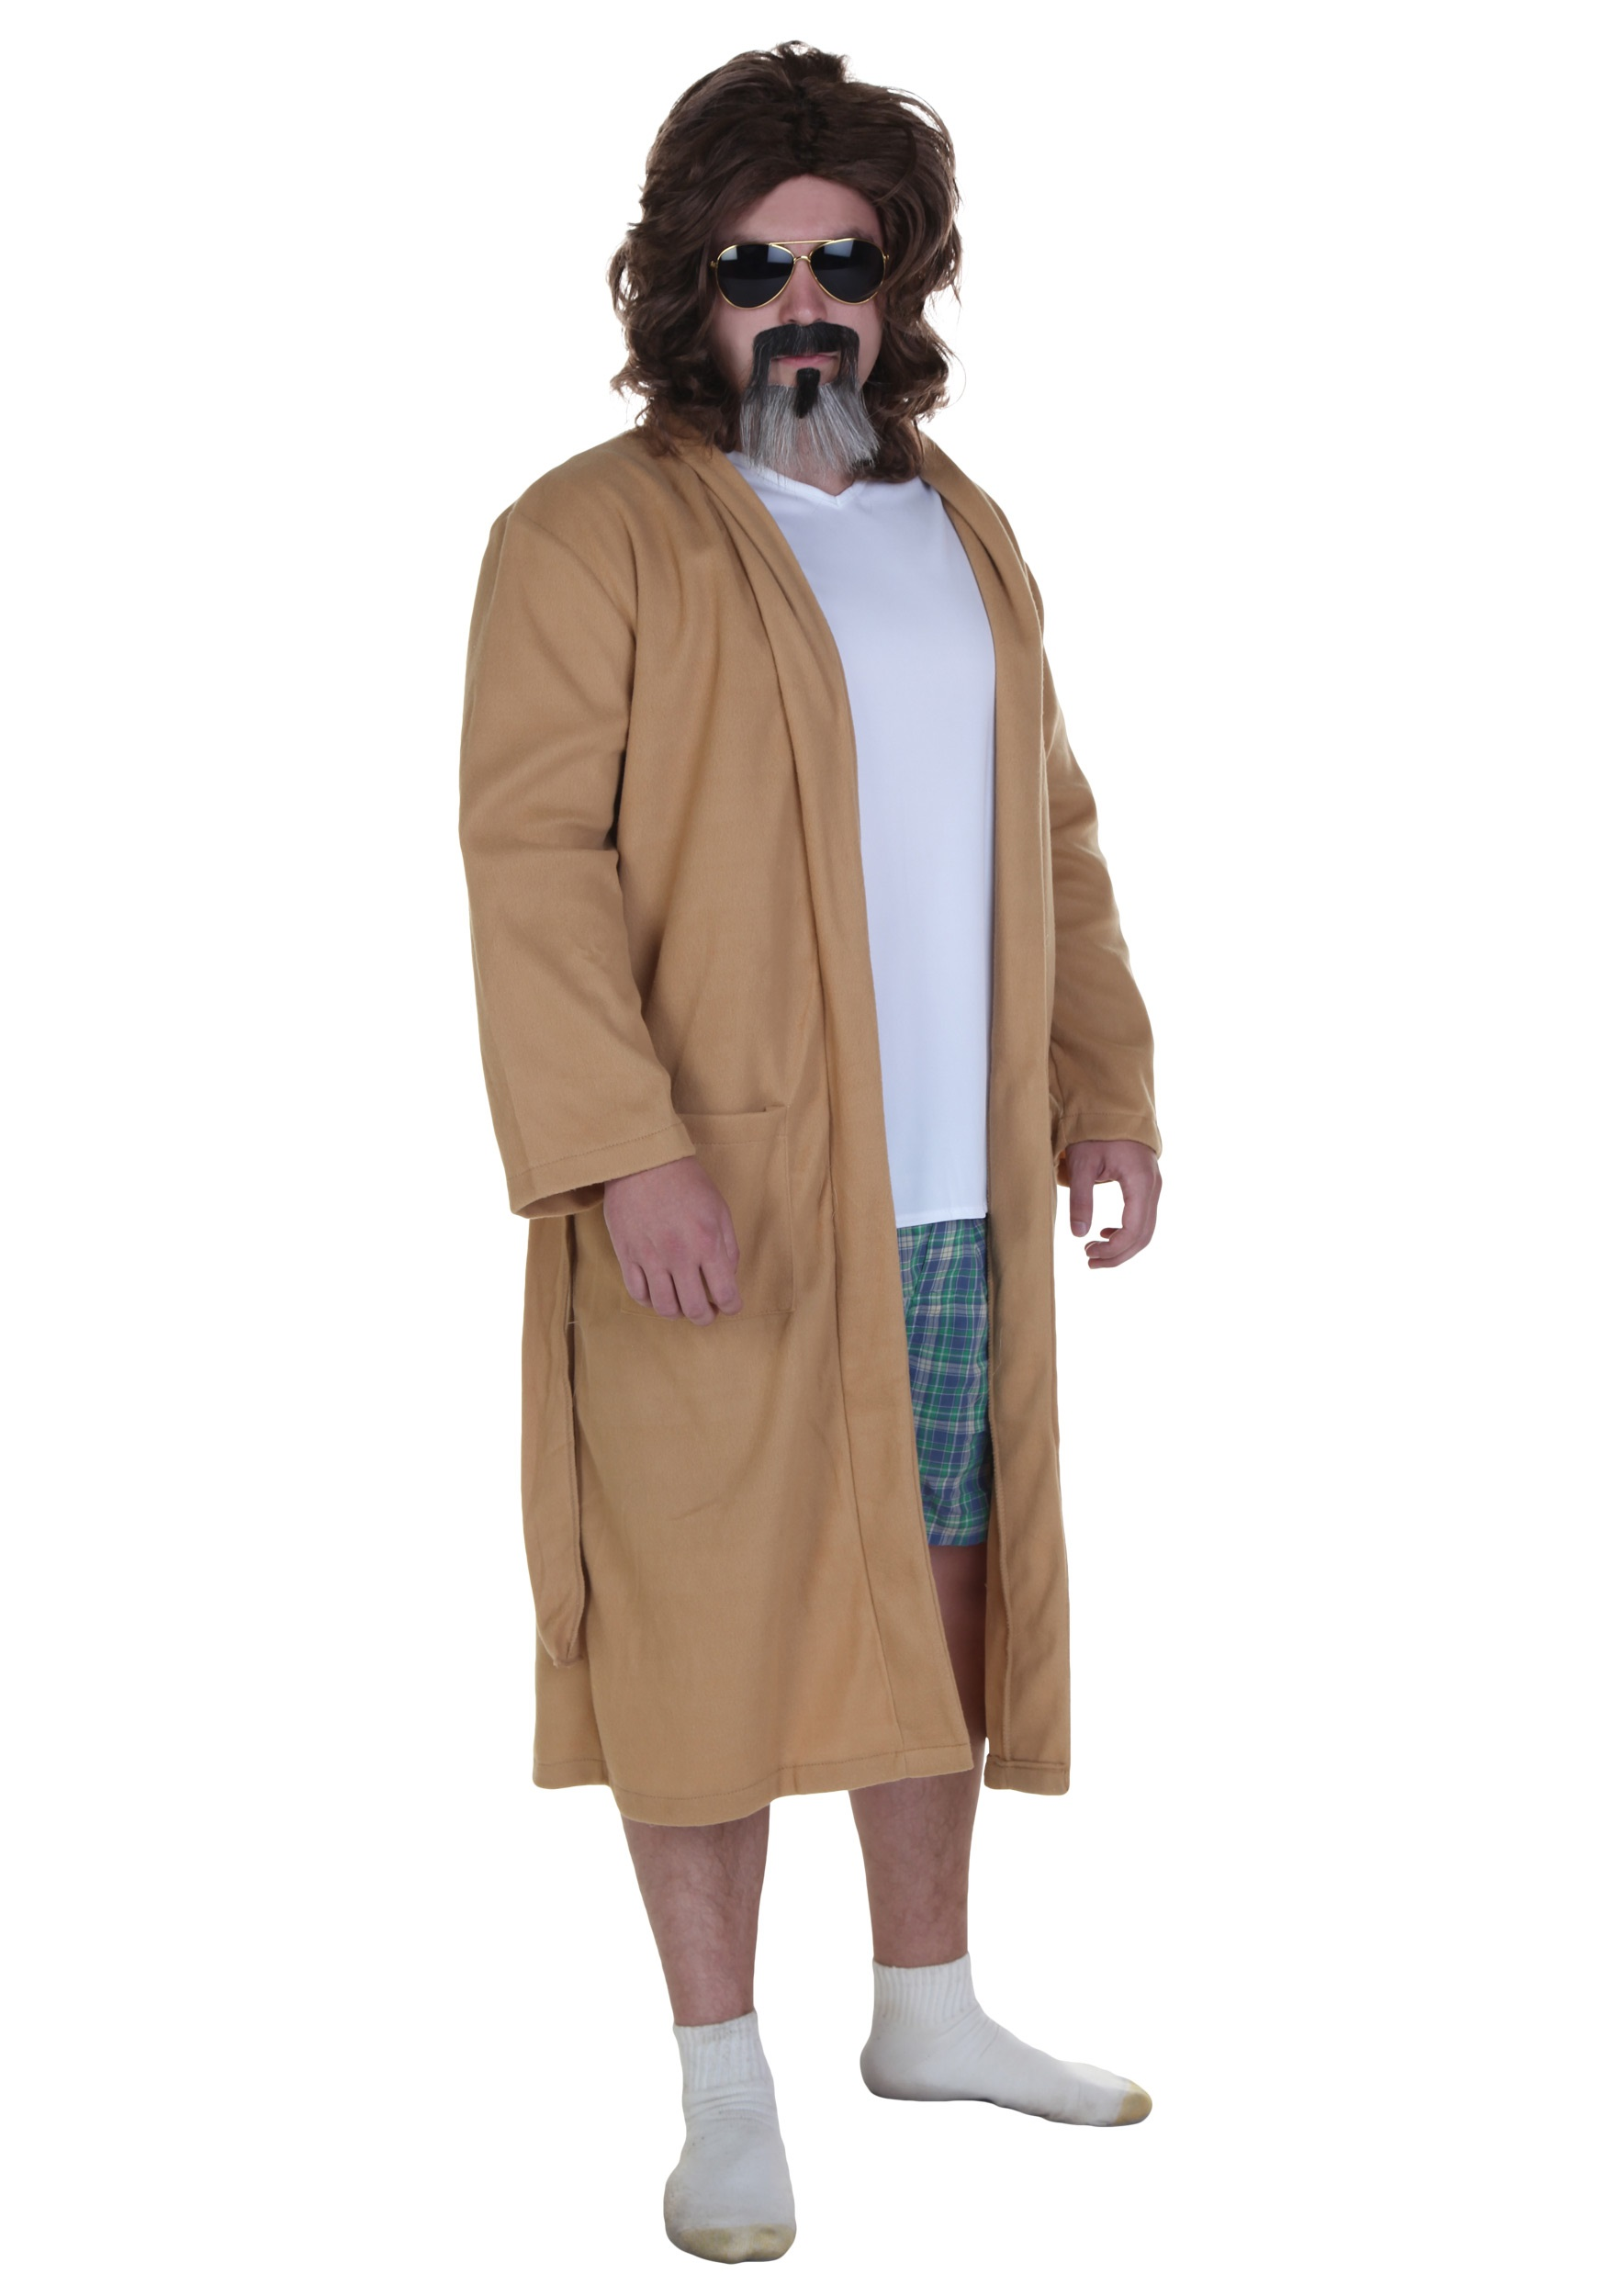 Big Lebowski The Dude Bath Robe Costume Halloween Costume Ideas 2021